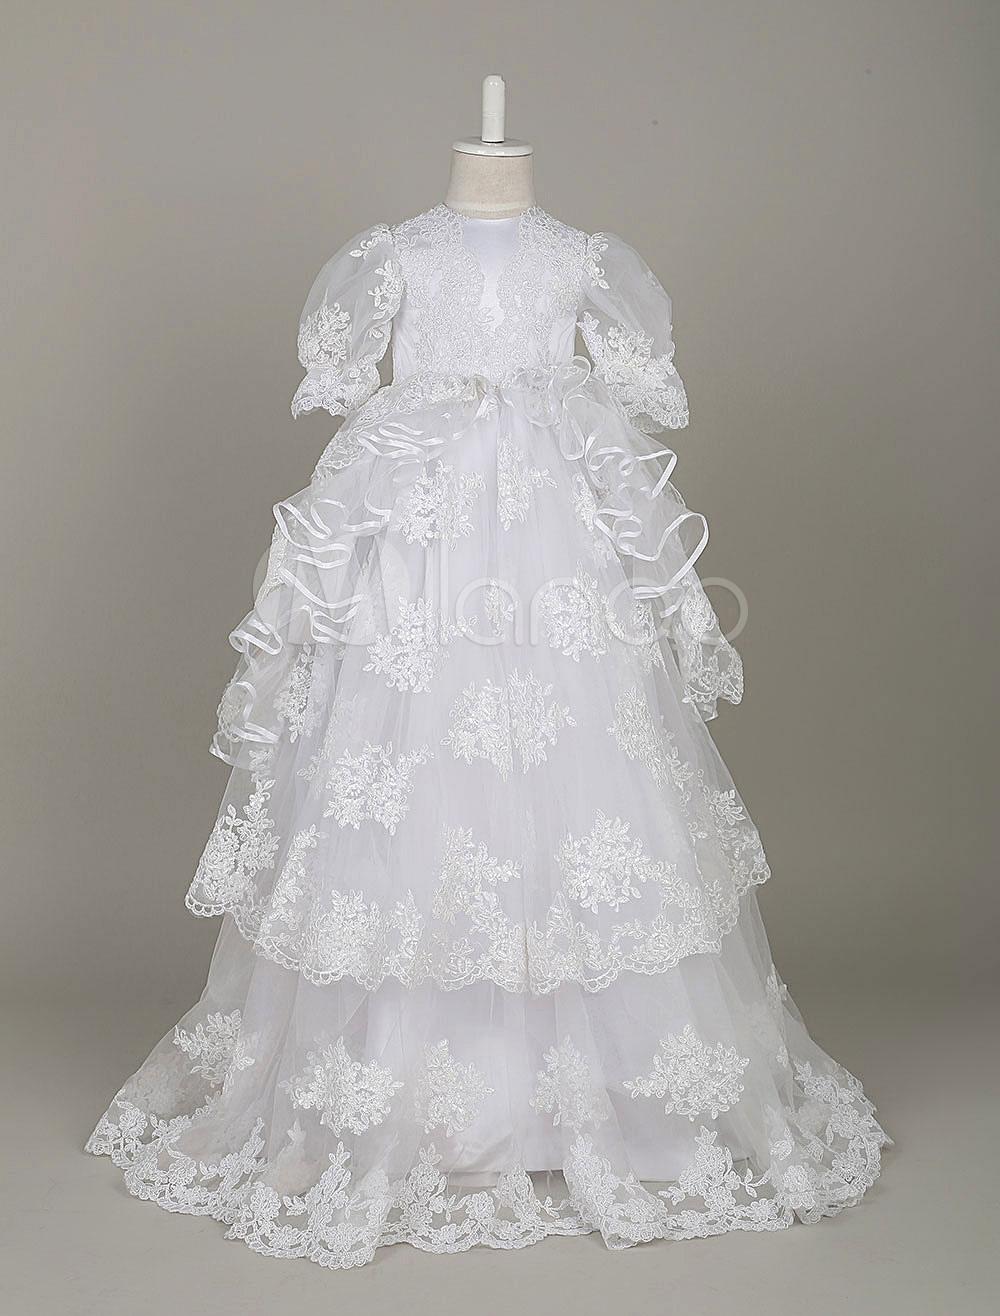 Tulle Flower Girl Dress Vintage Princess Pageant Dress White Short Sleeve Lace Applique Toddler's Dinner Dress With Train (Wedding Flower Girl Dresses) photo